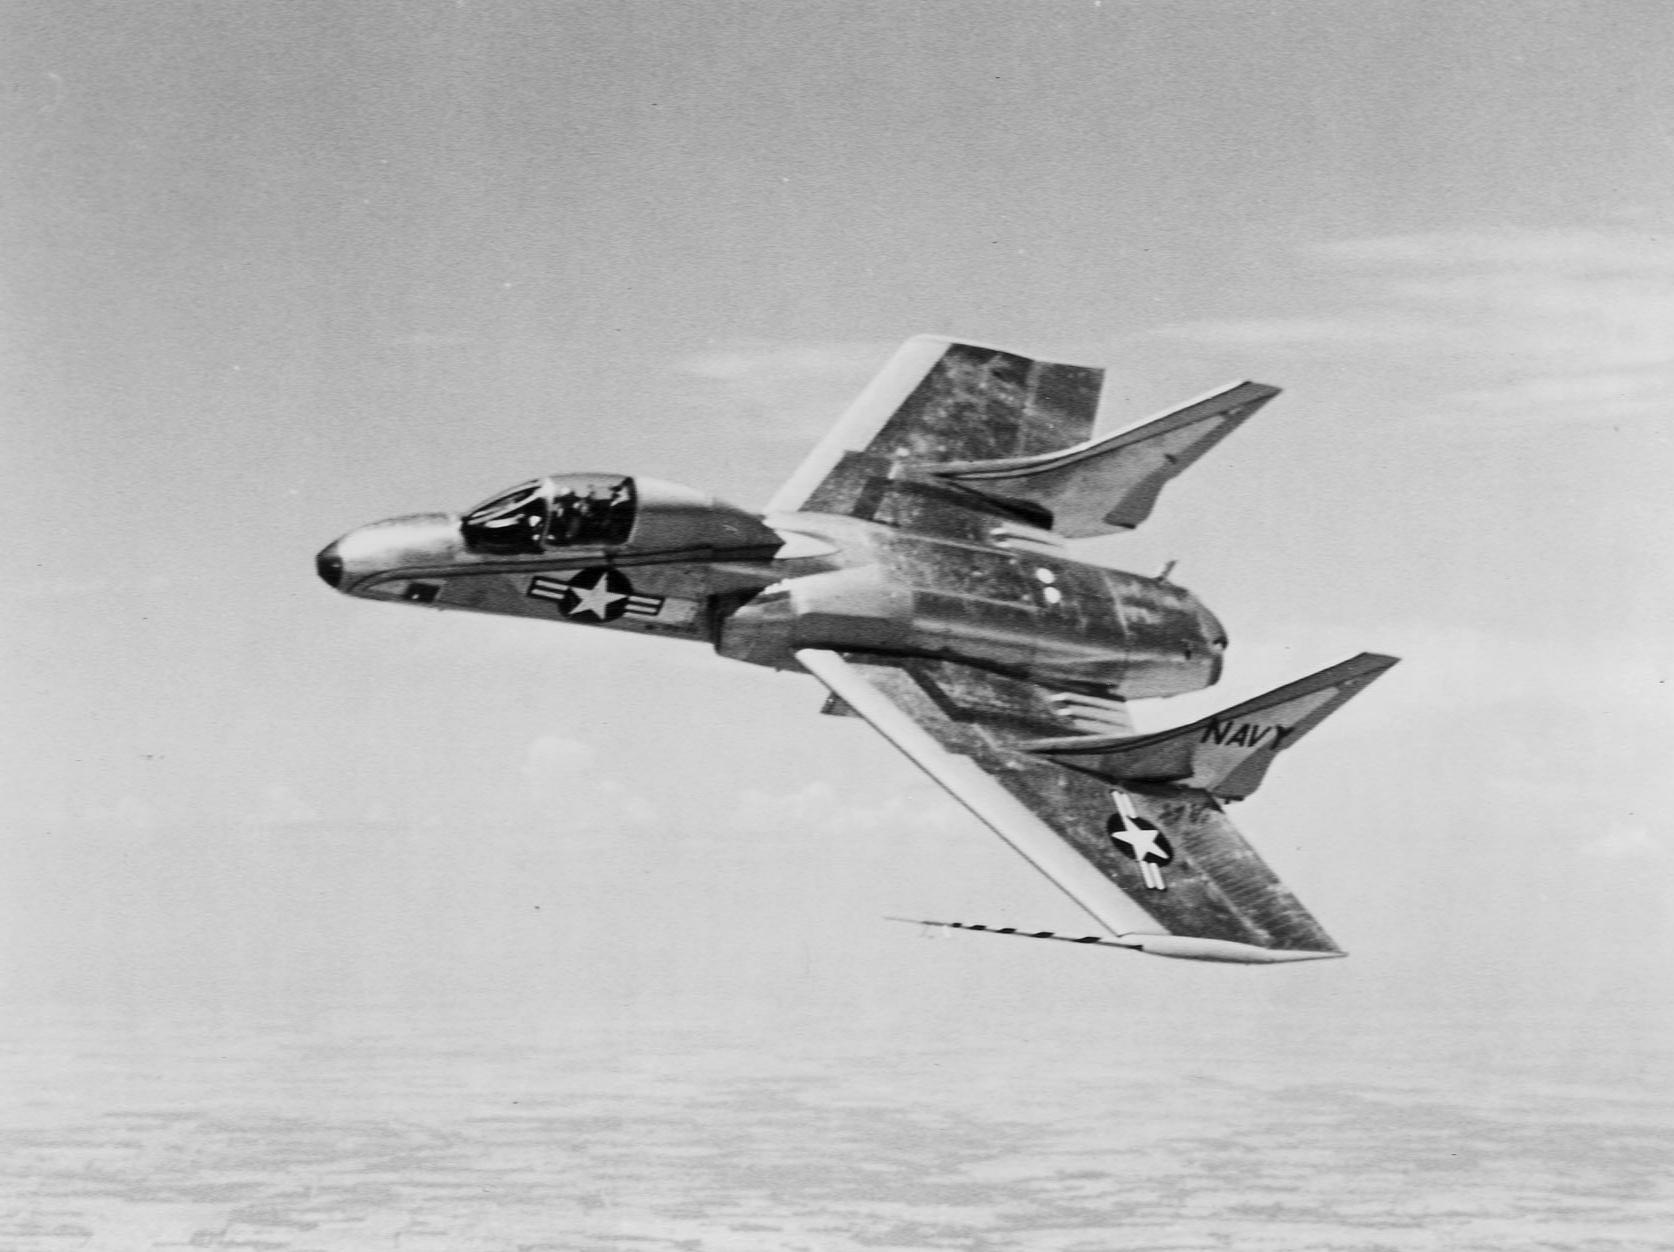 50 >> File:F7U-3P Cutlass in flight c1955.jpg - Wikimedia Commons